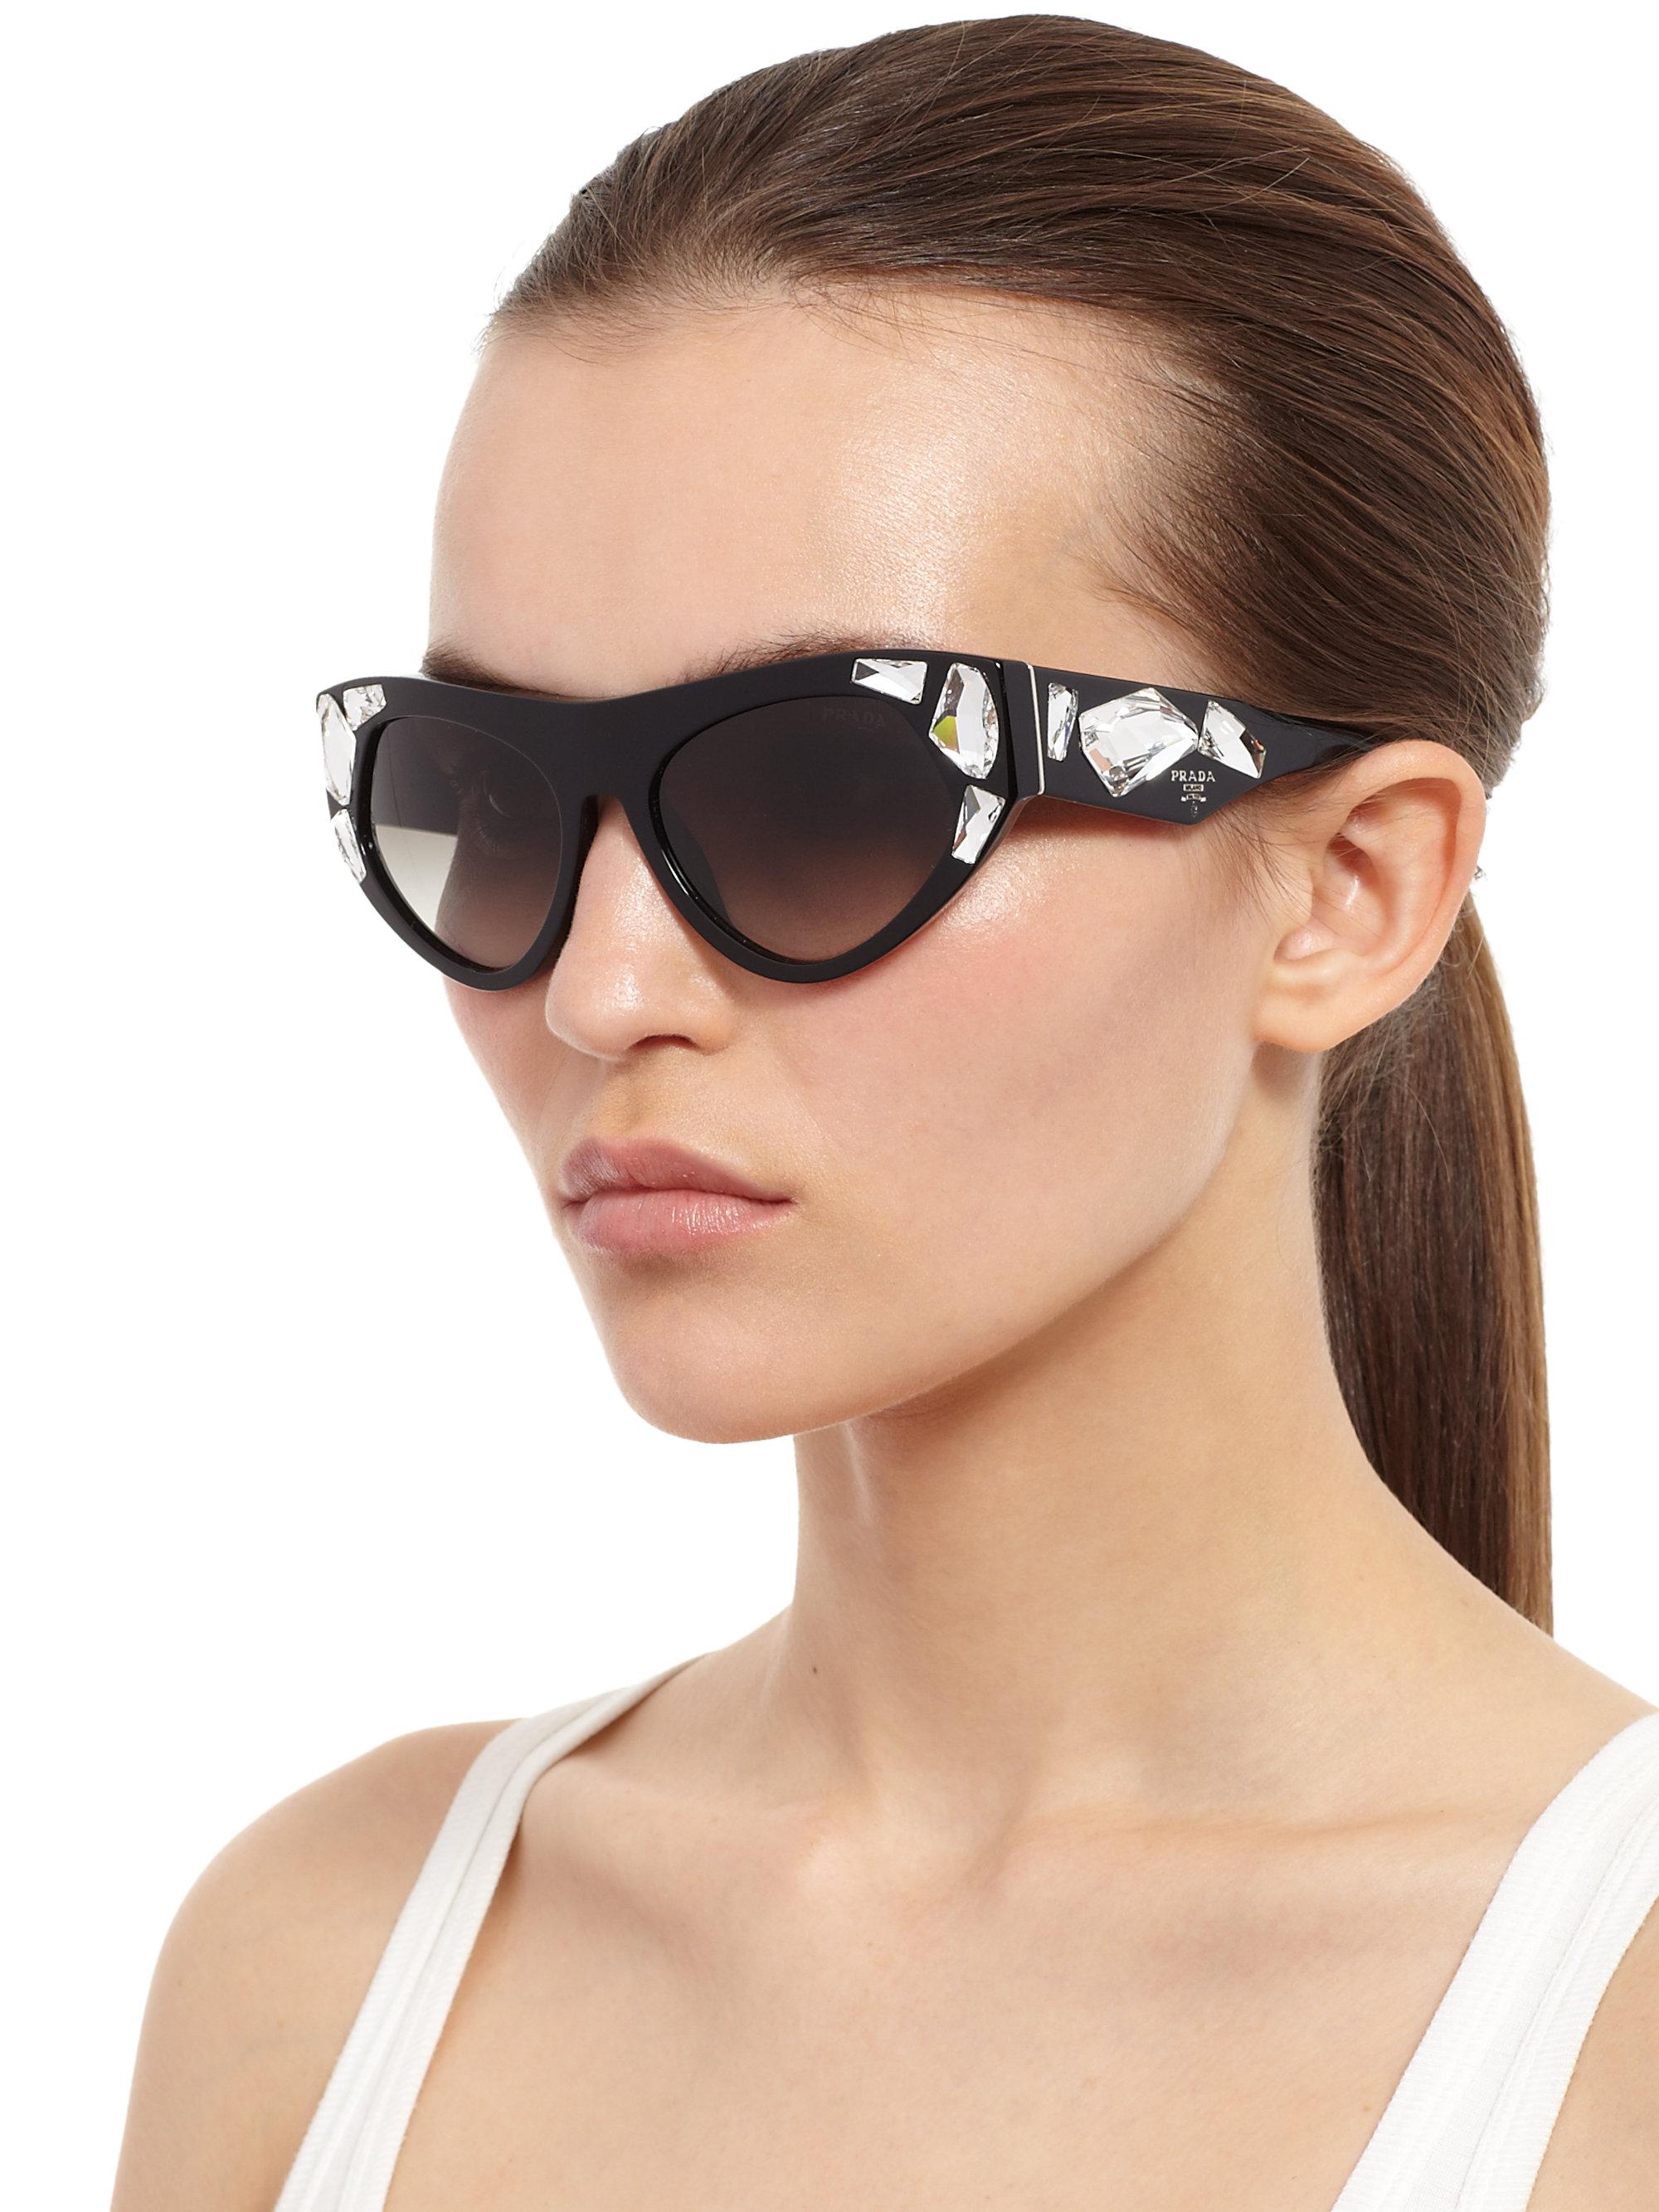 0500f5bd0044 Lyst - Prada Oversized Embellished Sunglasses in Black